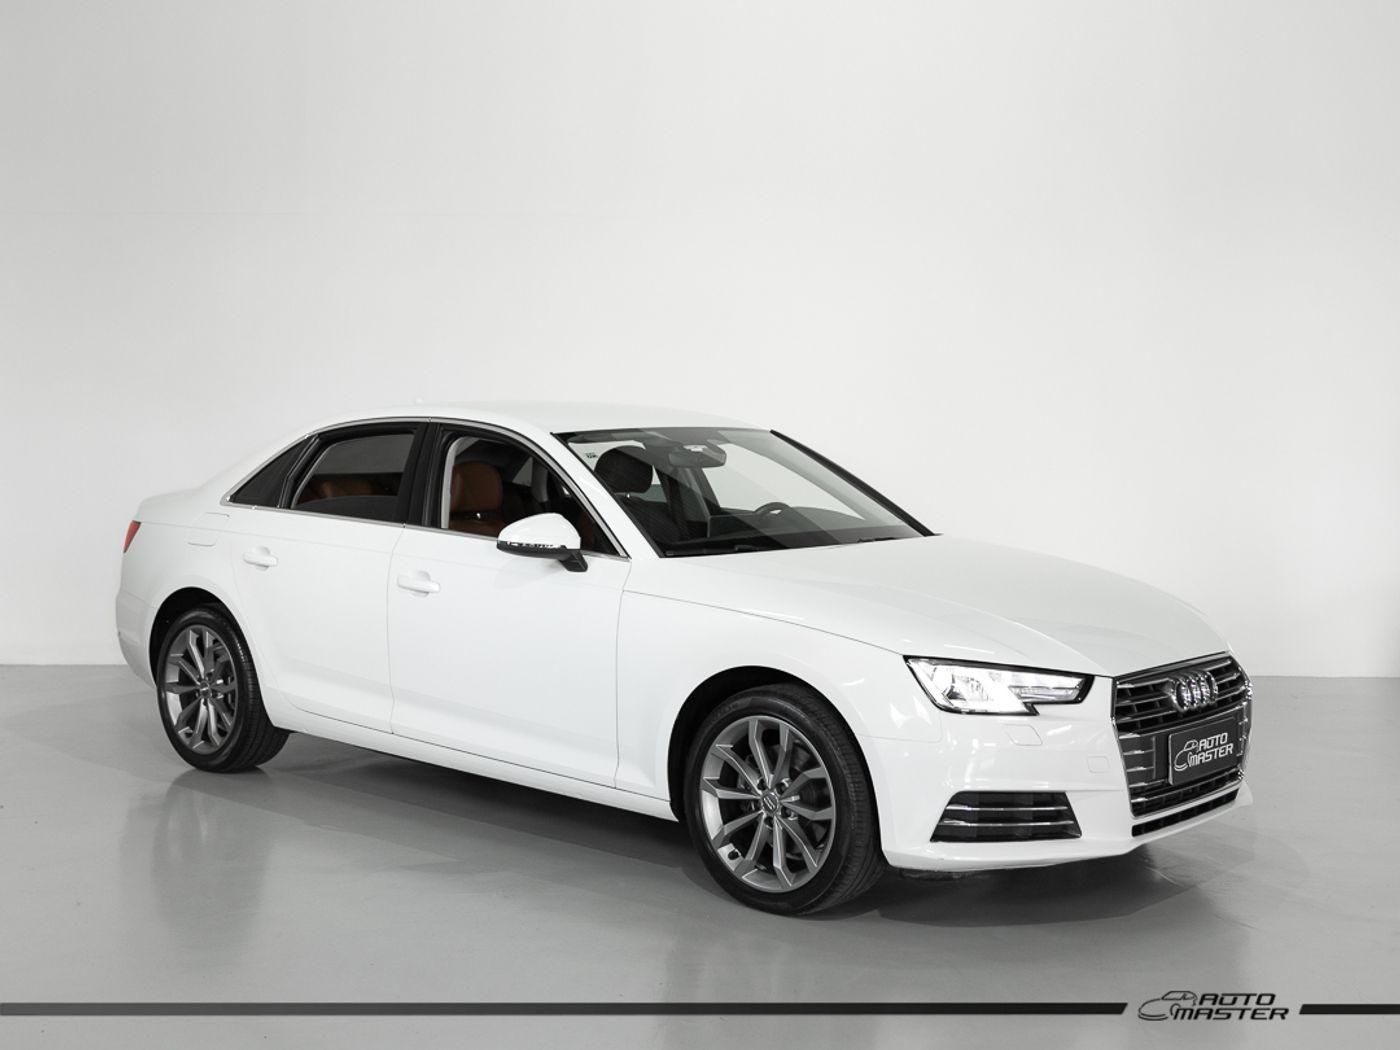 Audi A4 Ambiente 2.0 TFSI 190cv S tronic